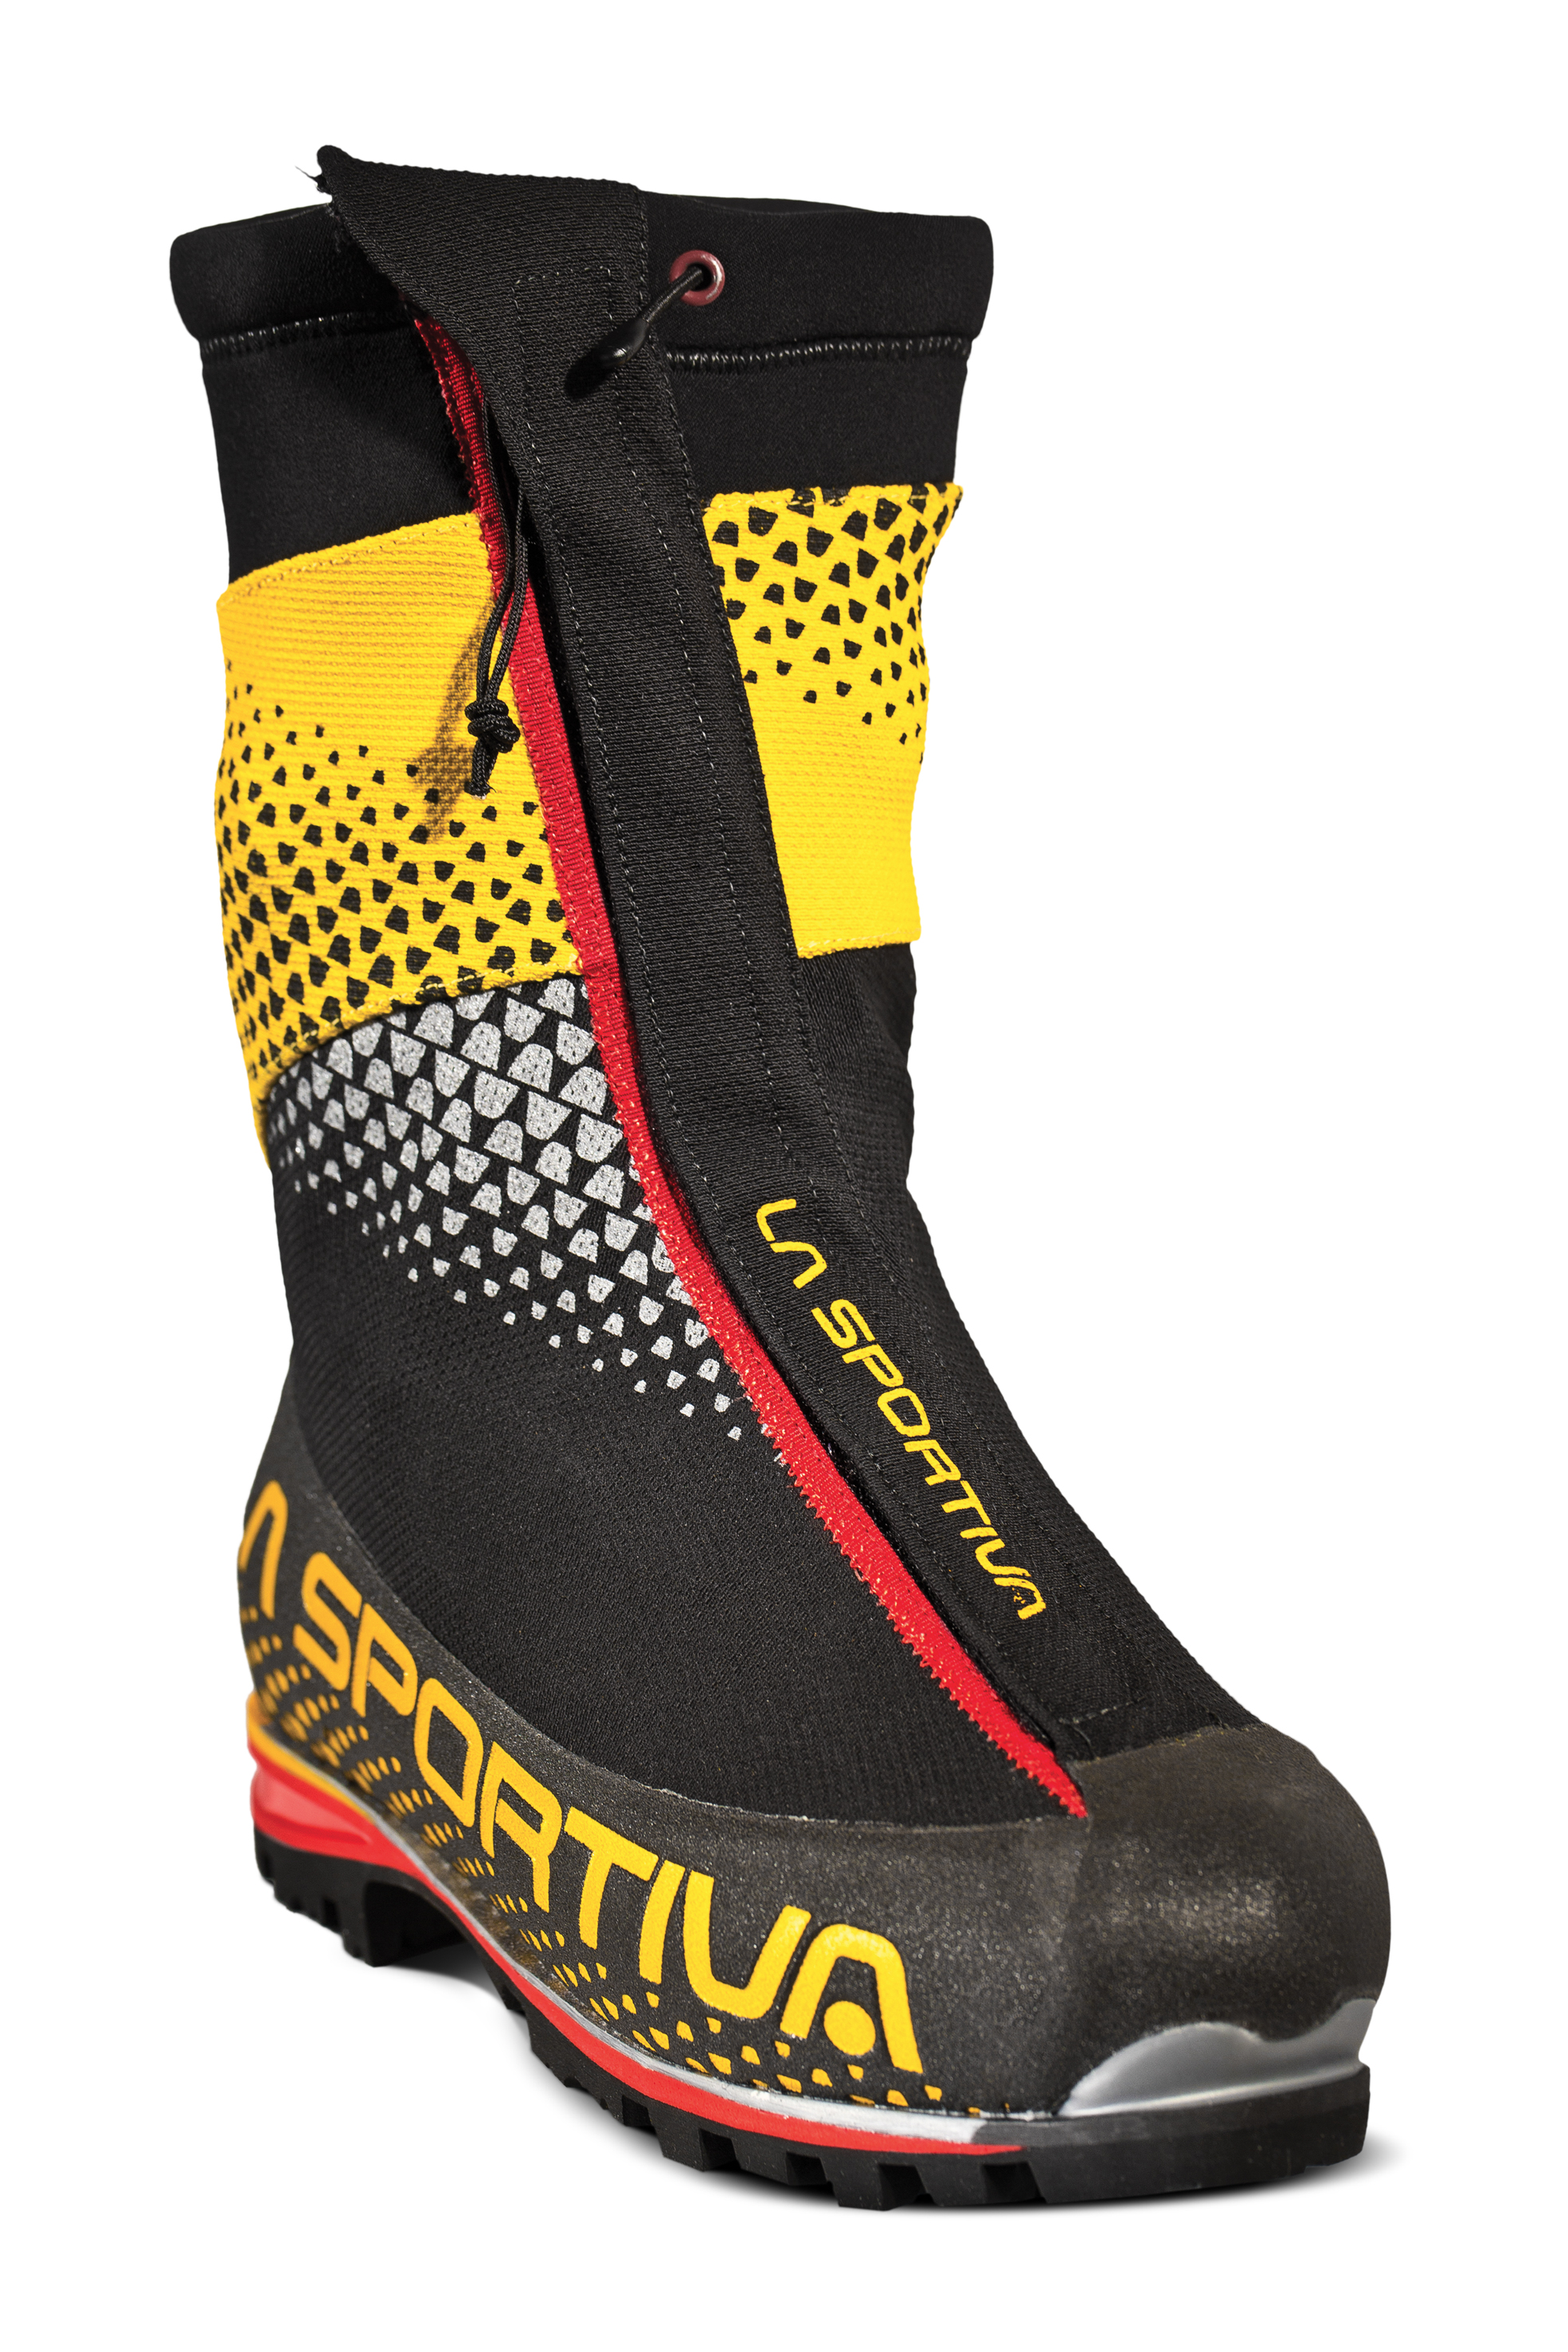 G2 SM black-yellow (11QBY) inclinata.jpg